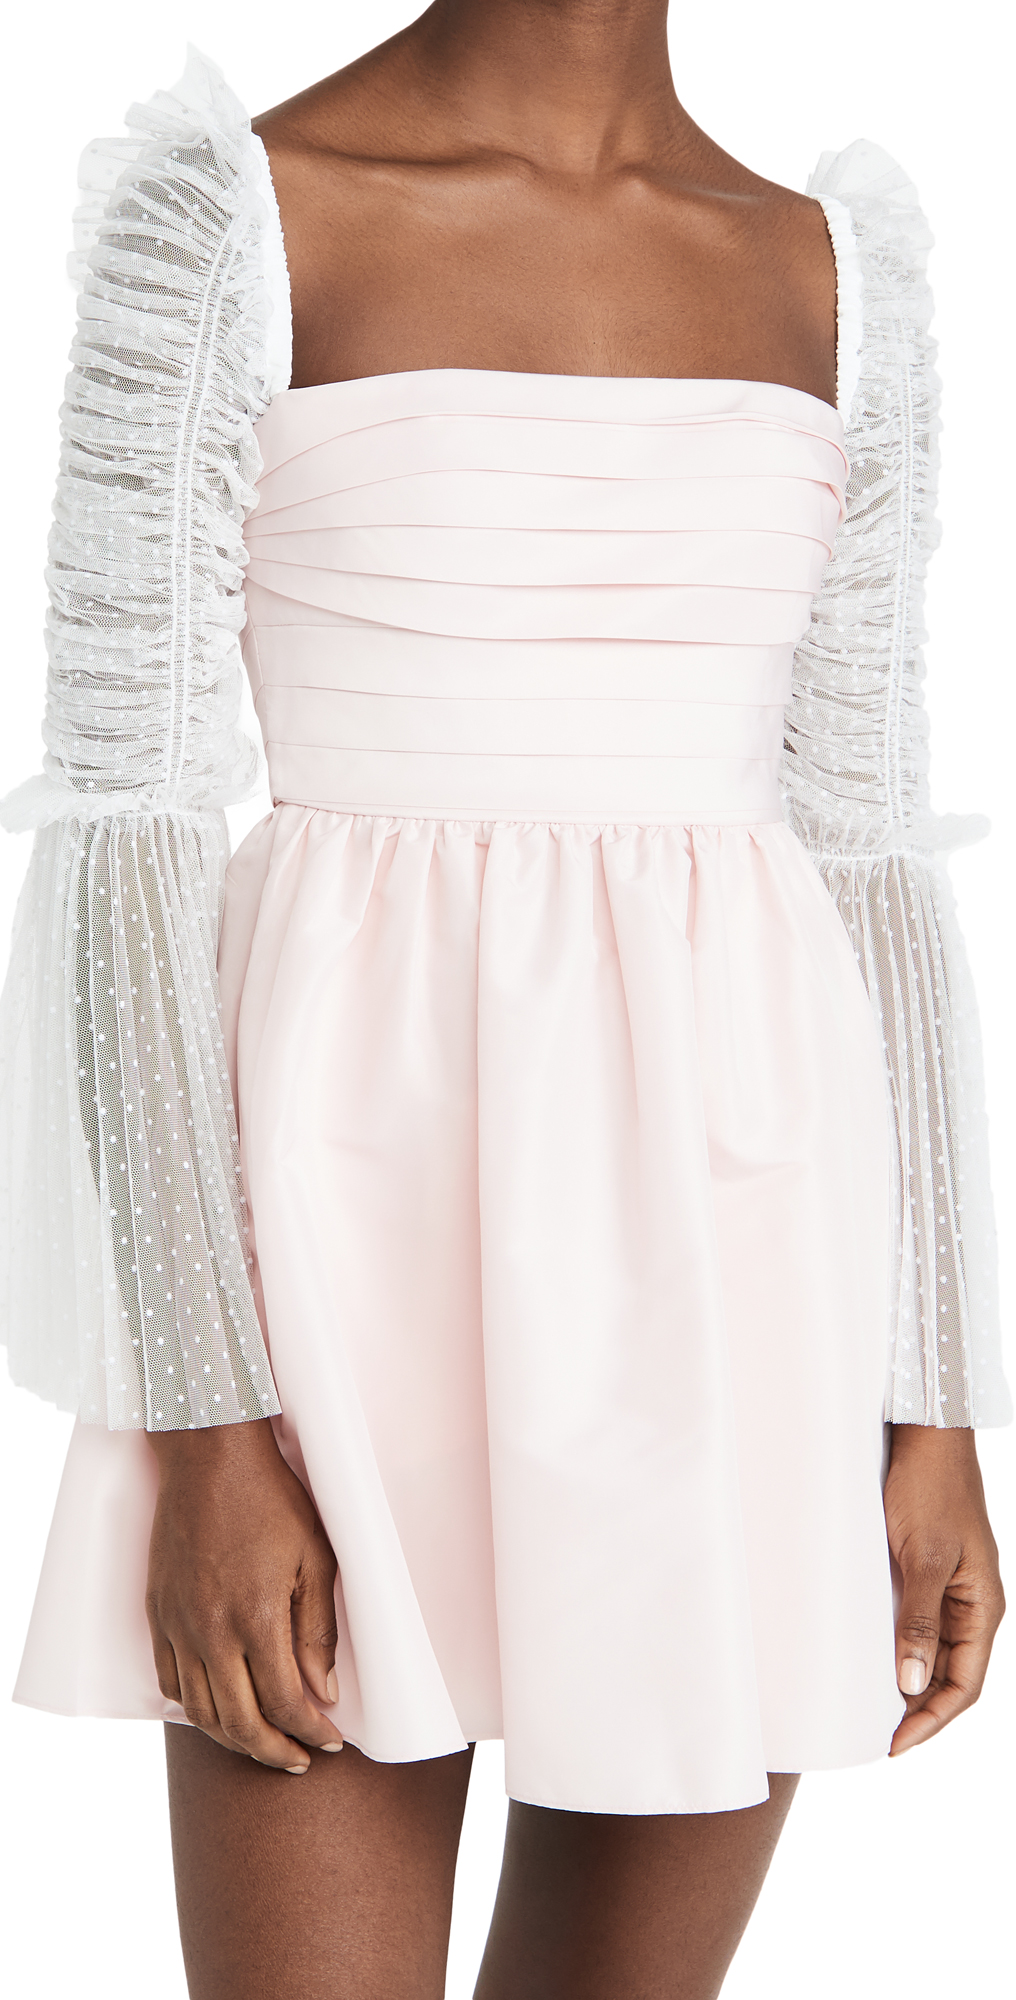 Self Portrait Pink Taffeta Dot Mesh Mini Dress